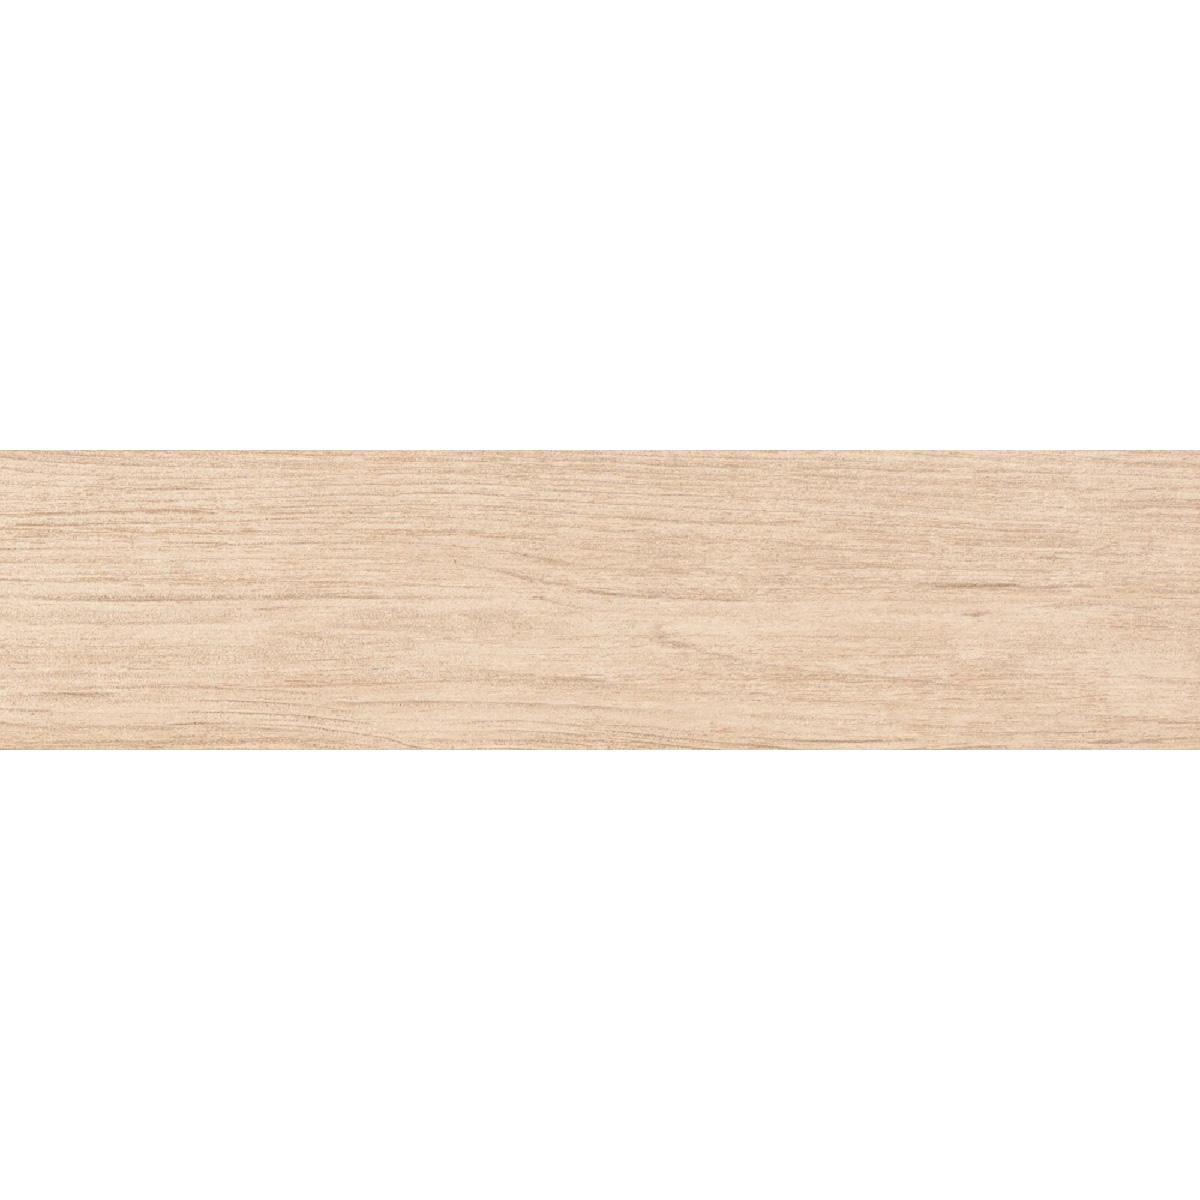 Плитка Bamboo (zsxptr3r) изображение 0